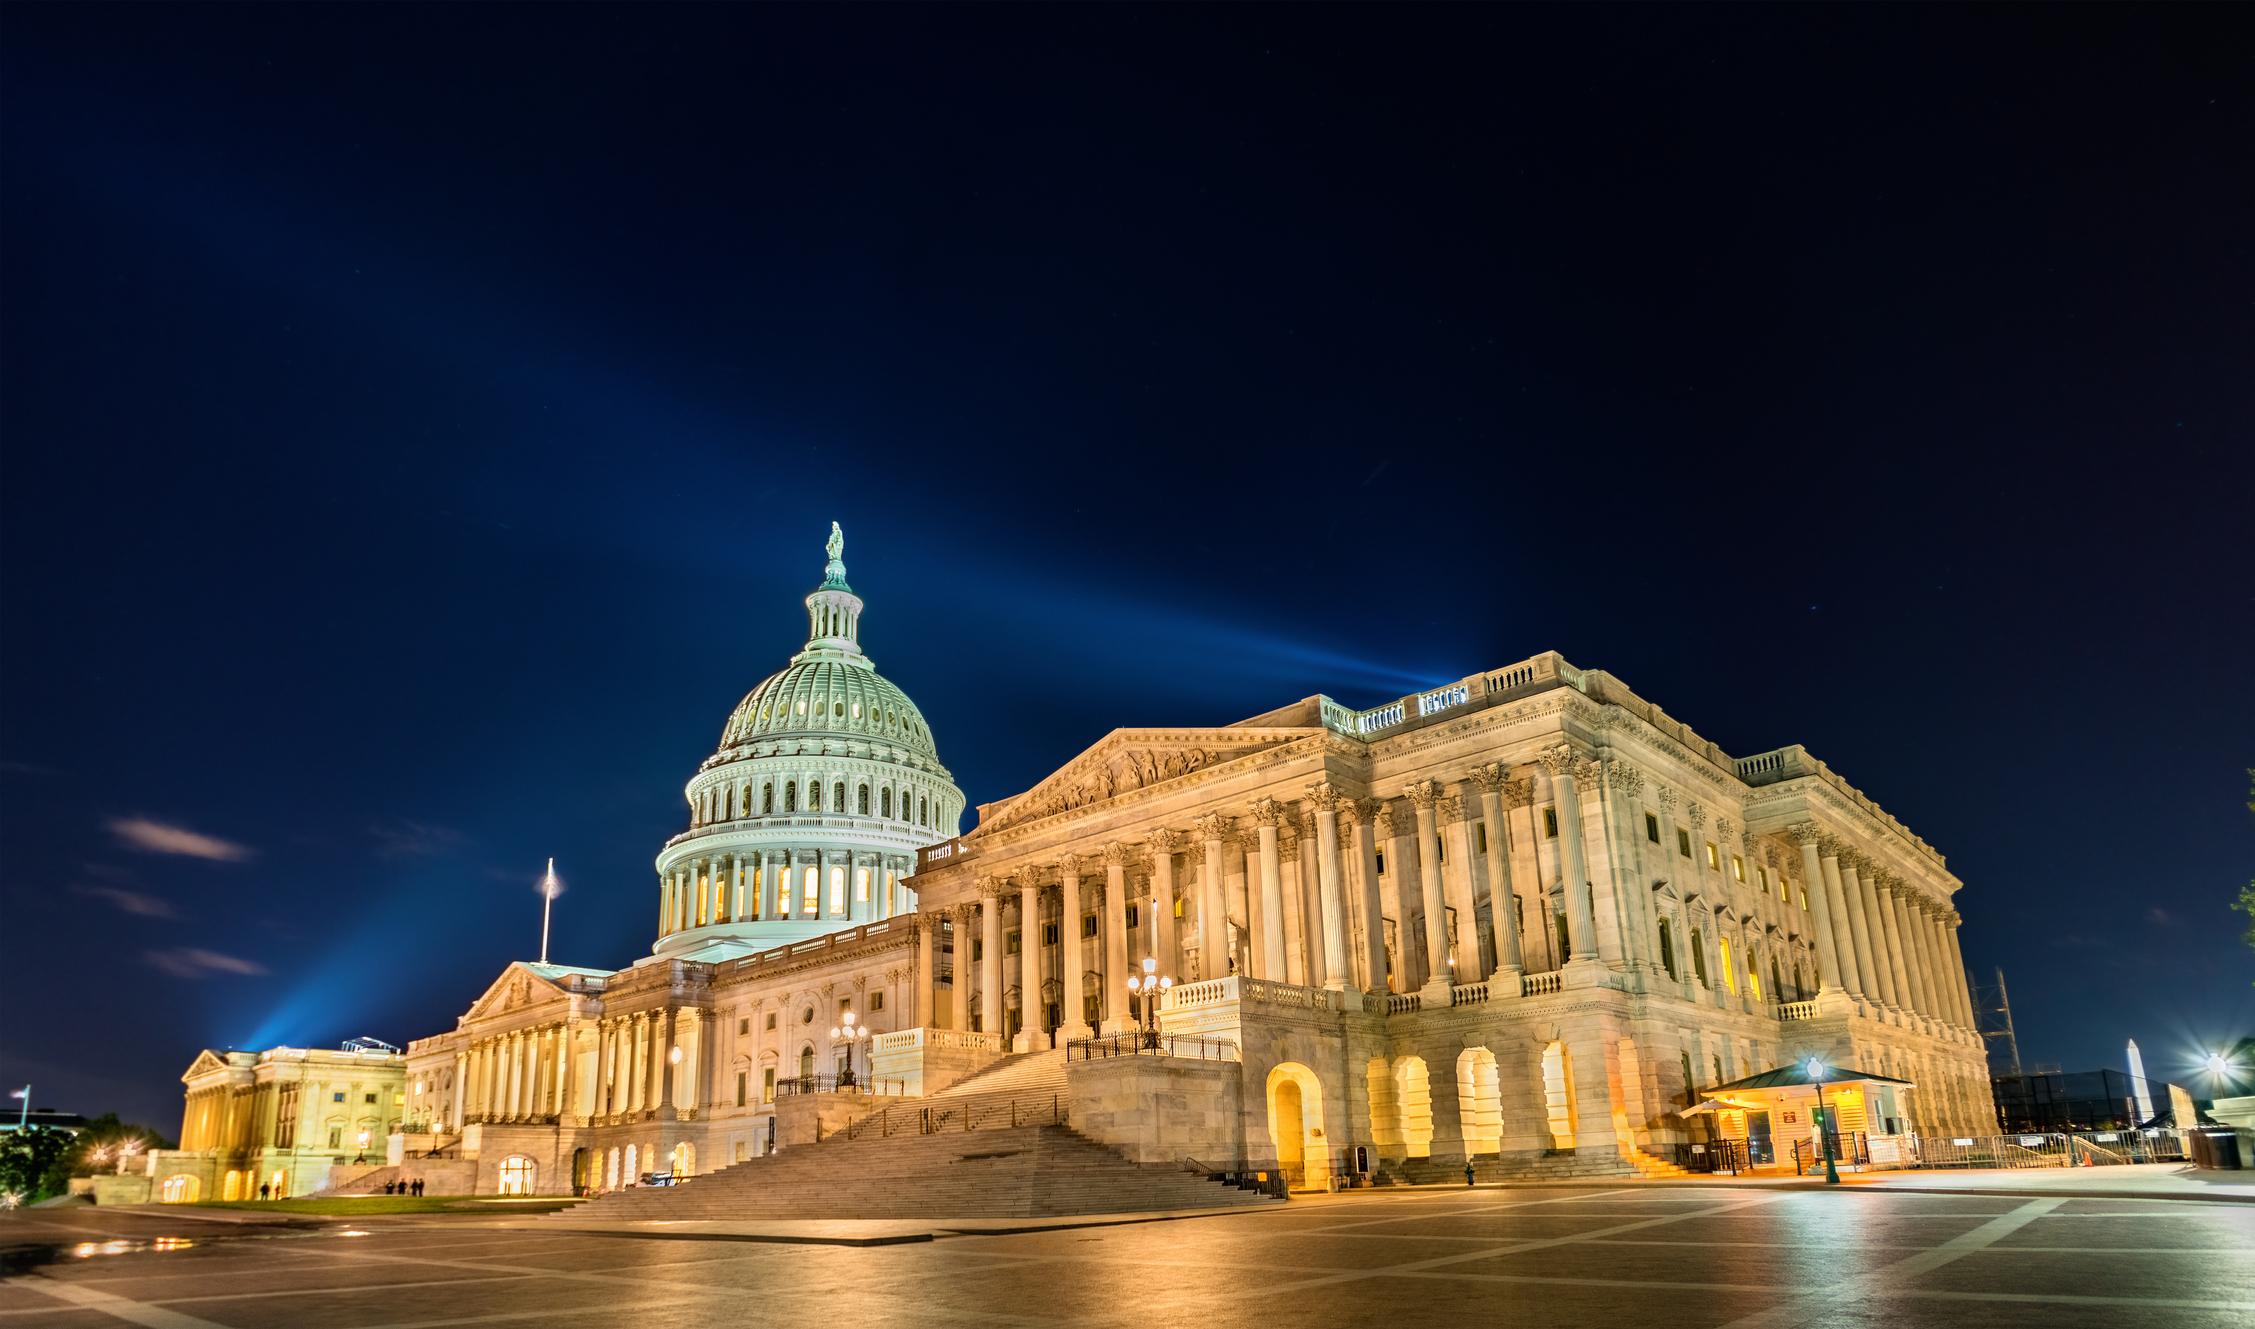 U.S. Capitol building at night.